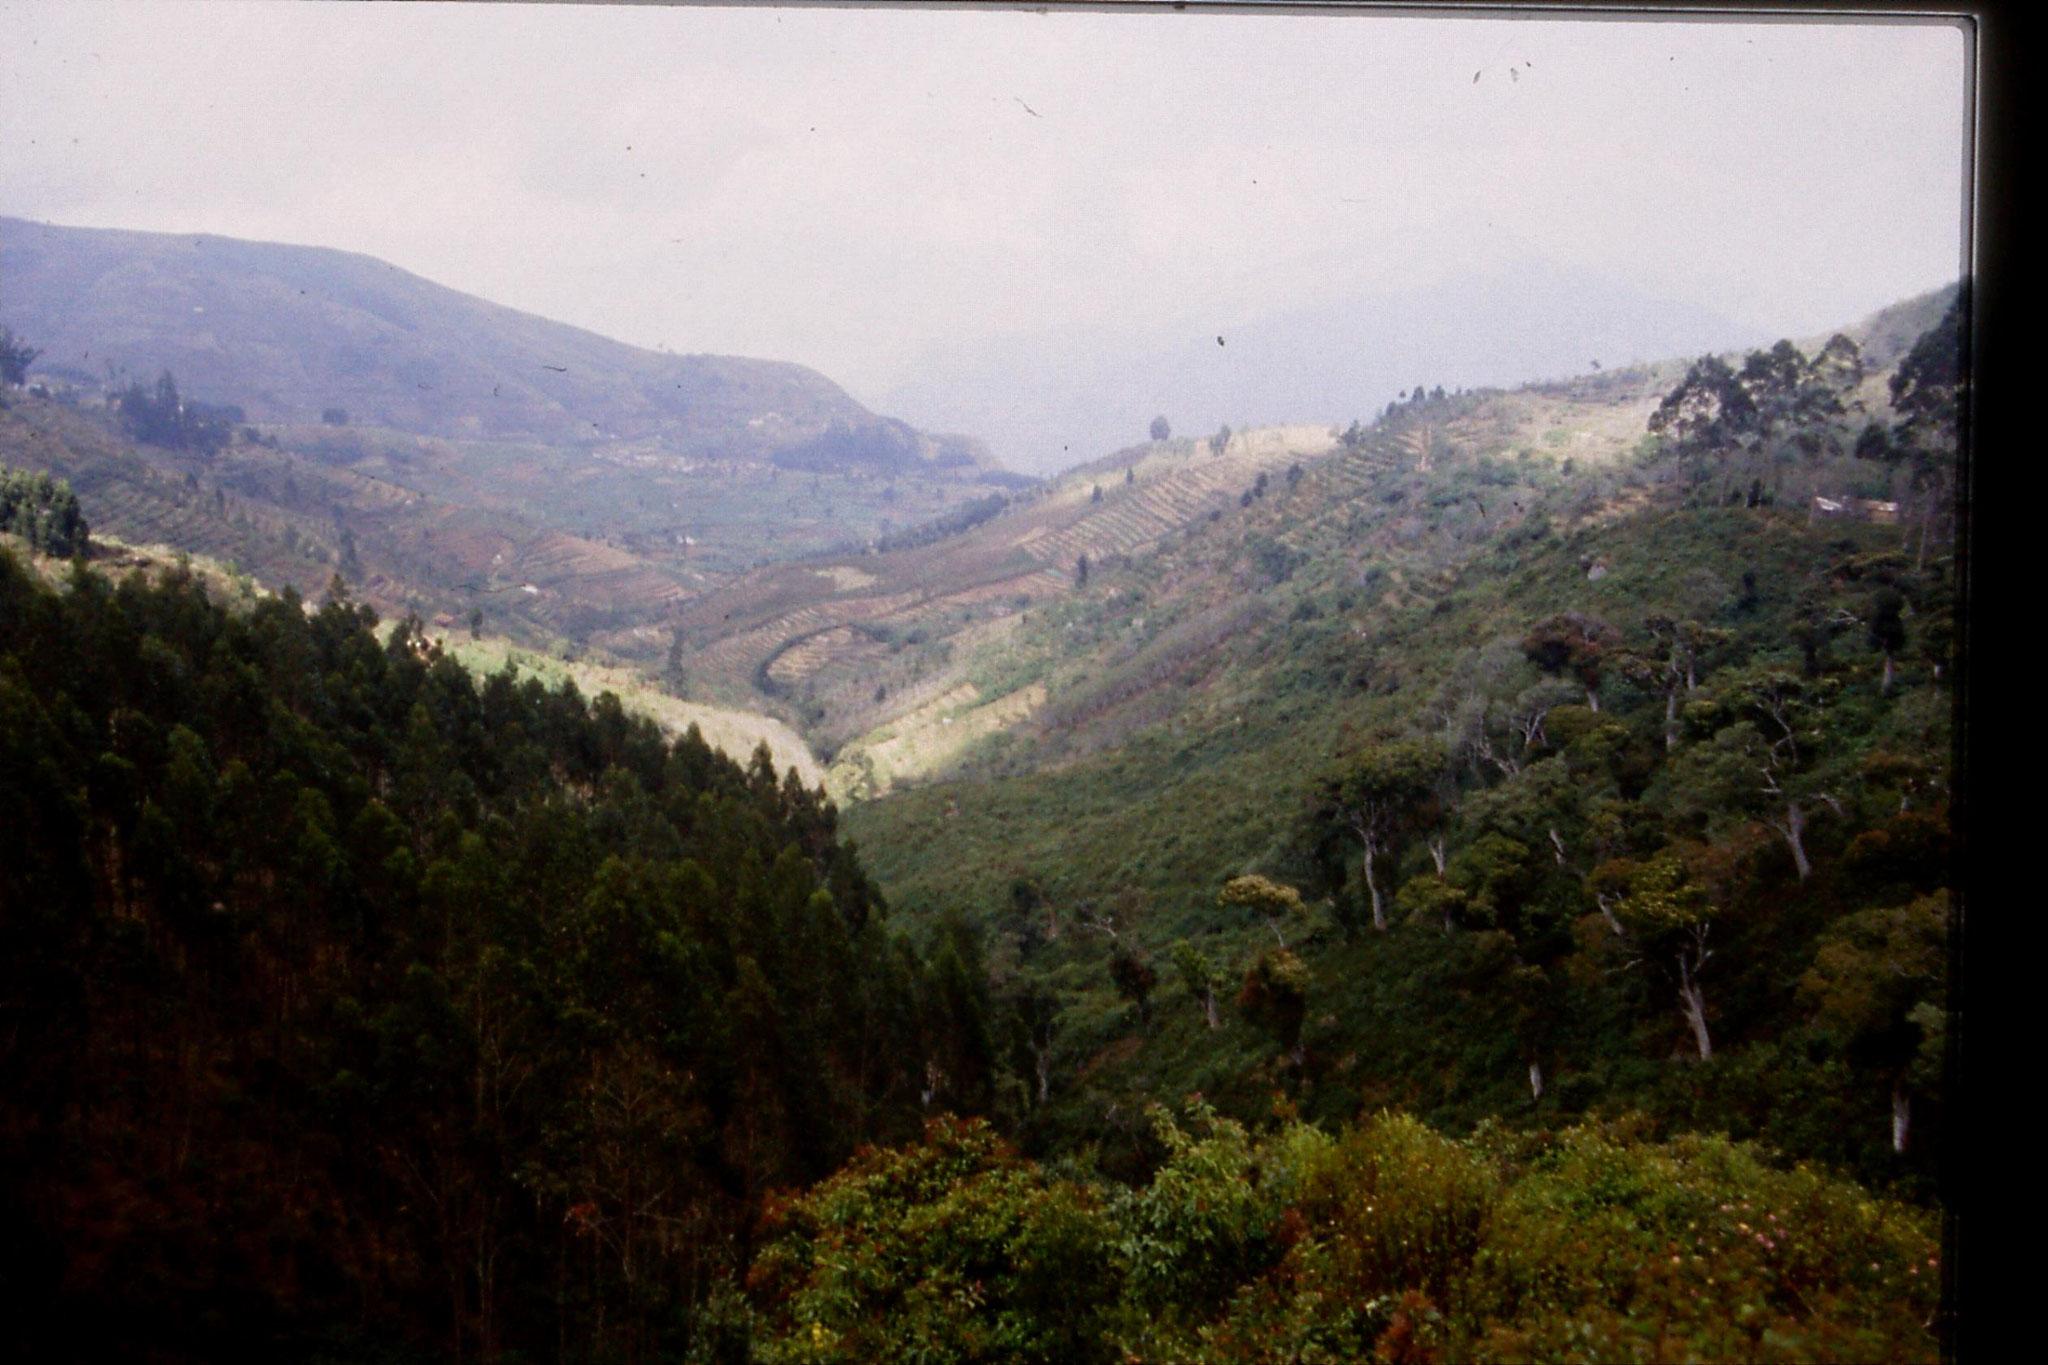 104/23: 20/2/1990 Vilpatti village and surroundings from Kodai road